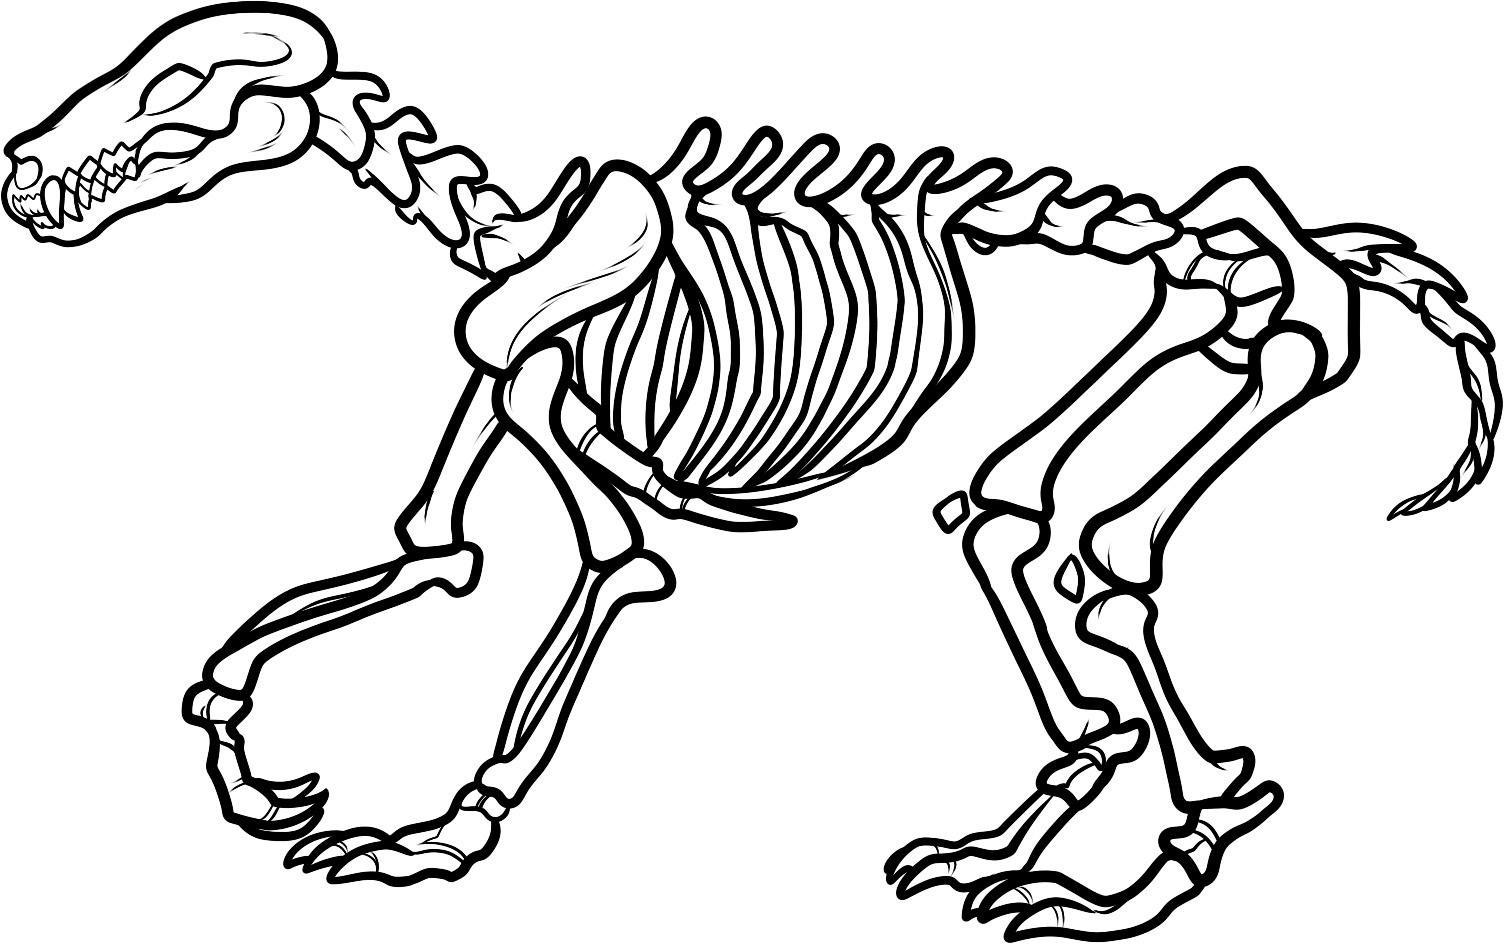 Dinosaur fossil clipart vector royalty free download Dinosaur Fossil Clip Art   Clipart Panda - Free Clipart Images vector royalty free download